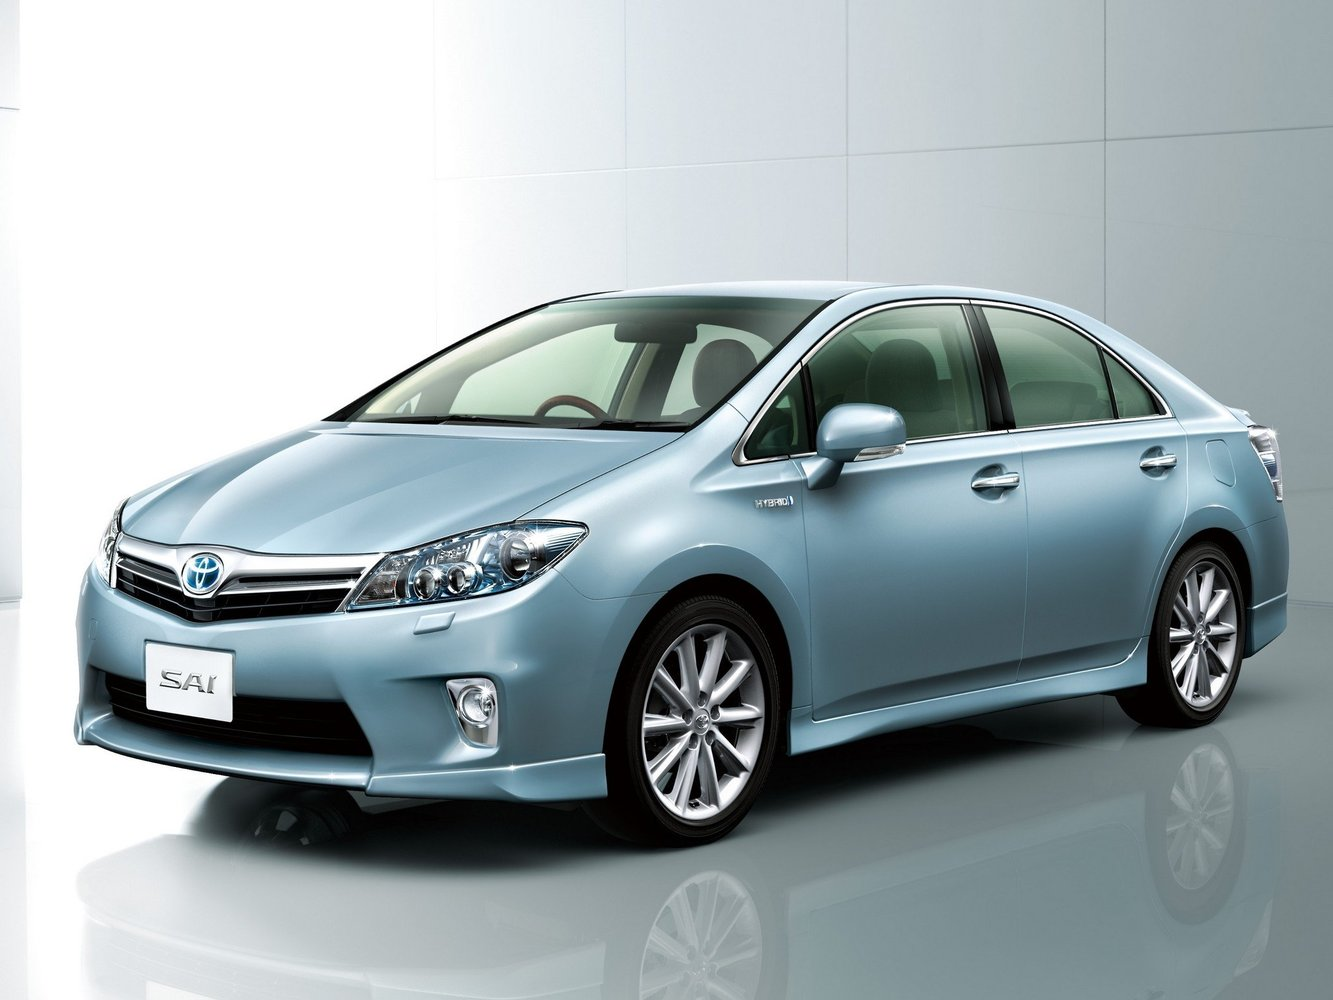 toyota Toyota Sai